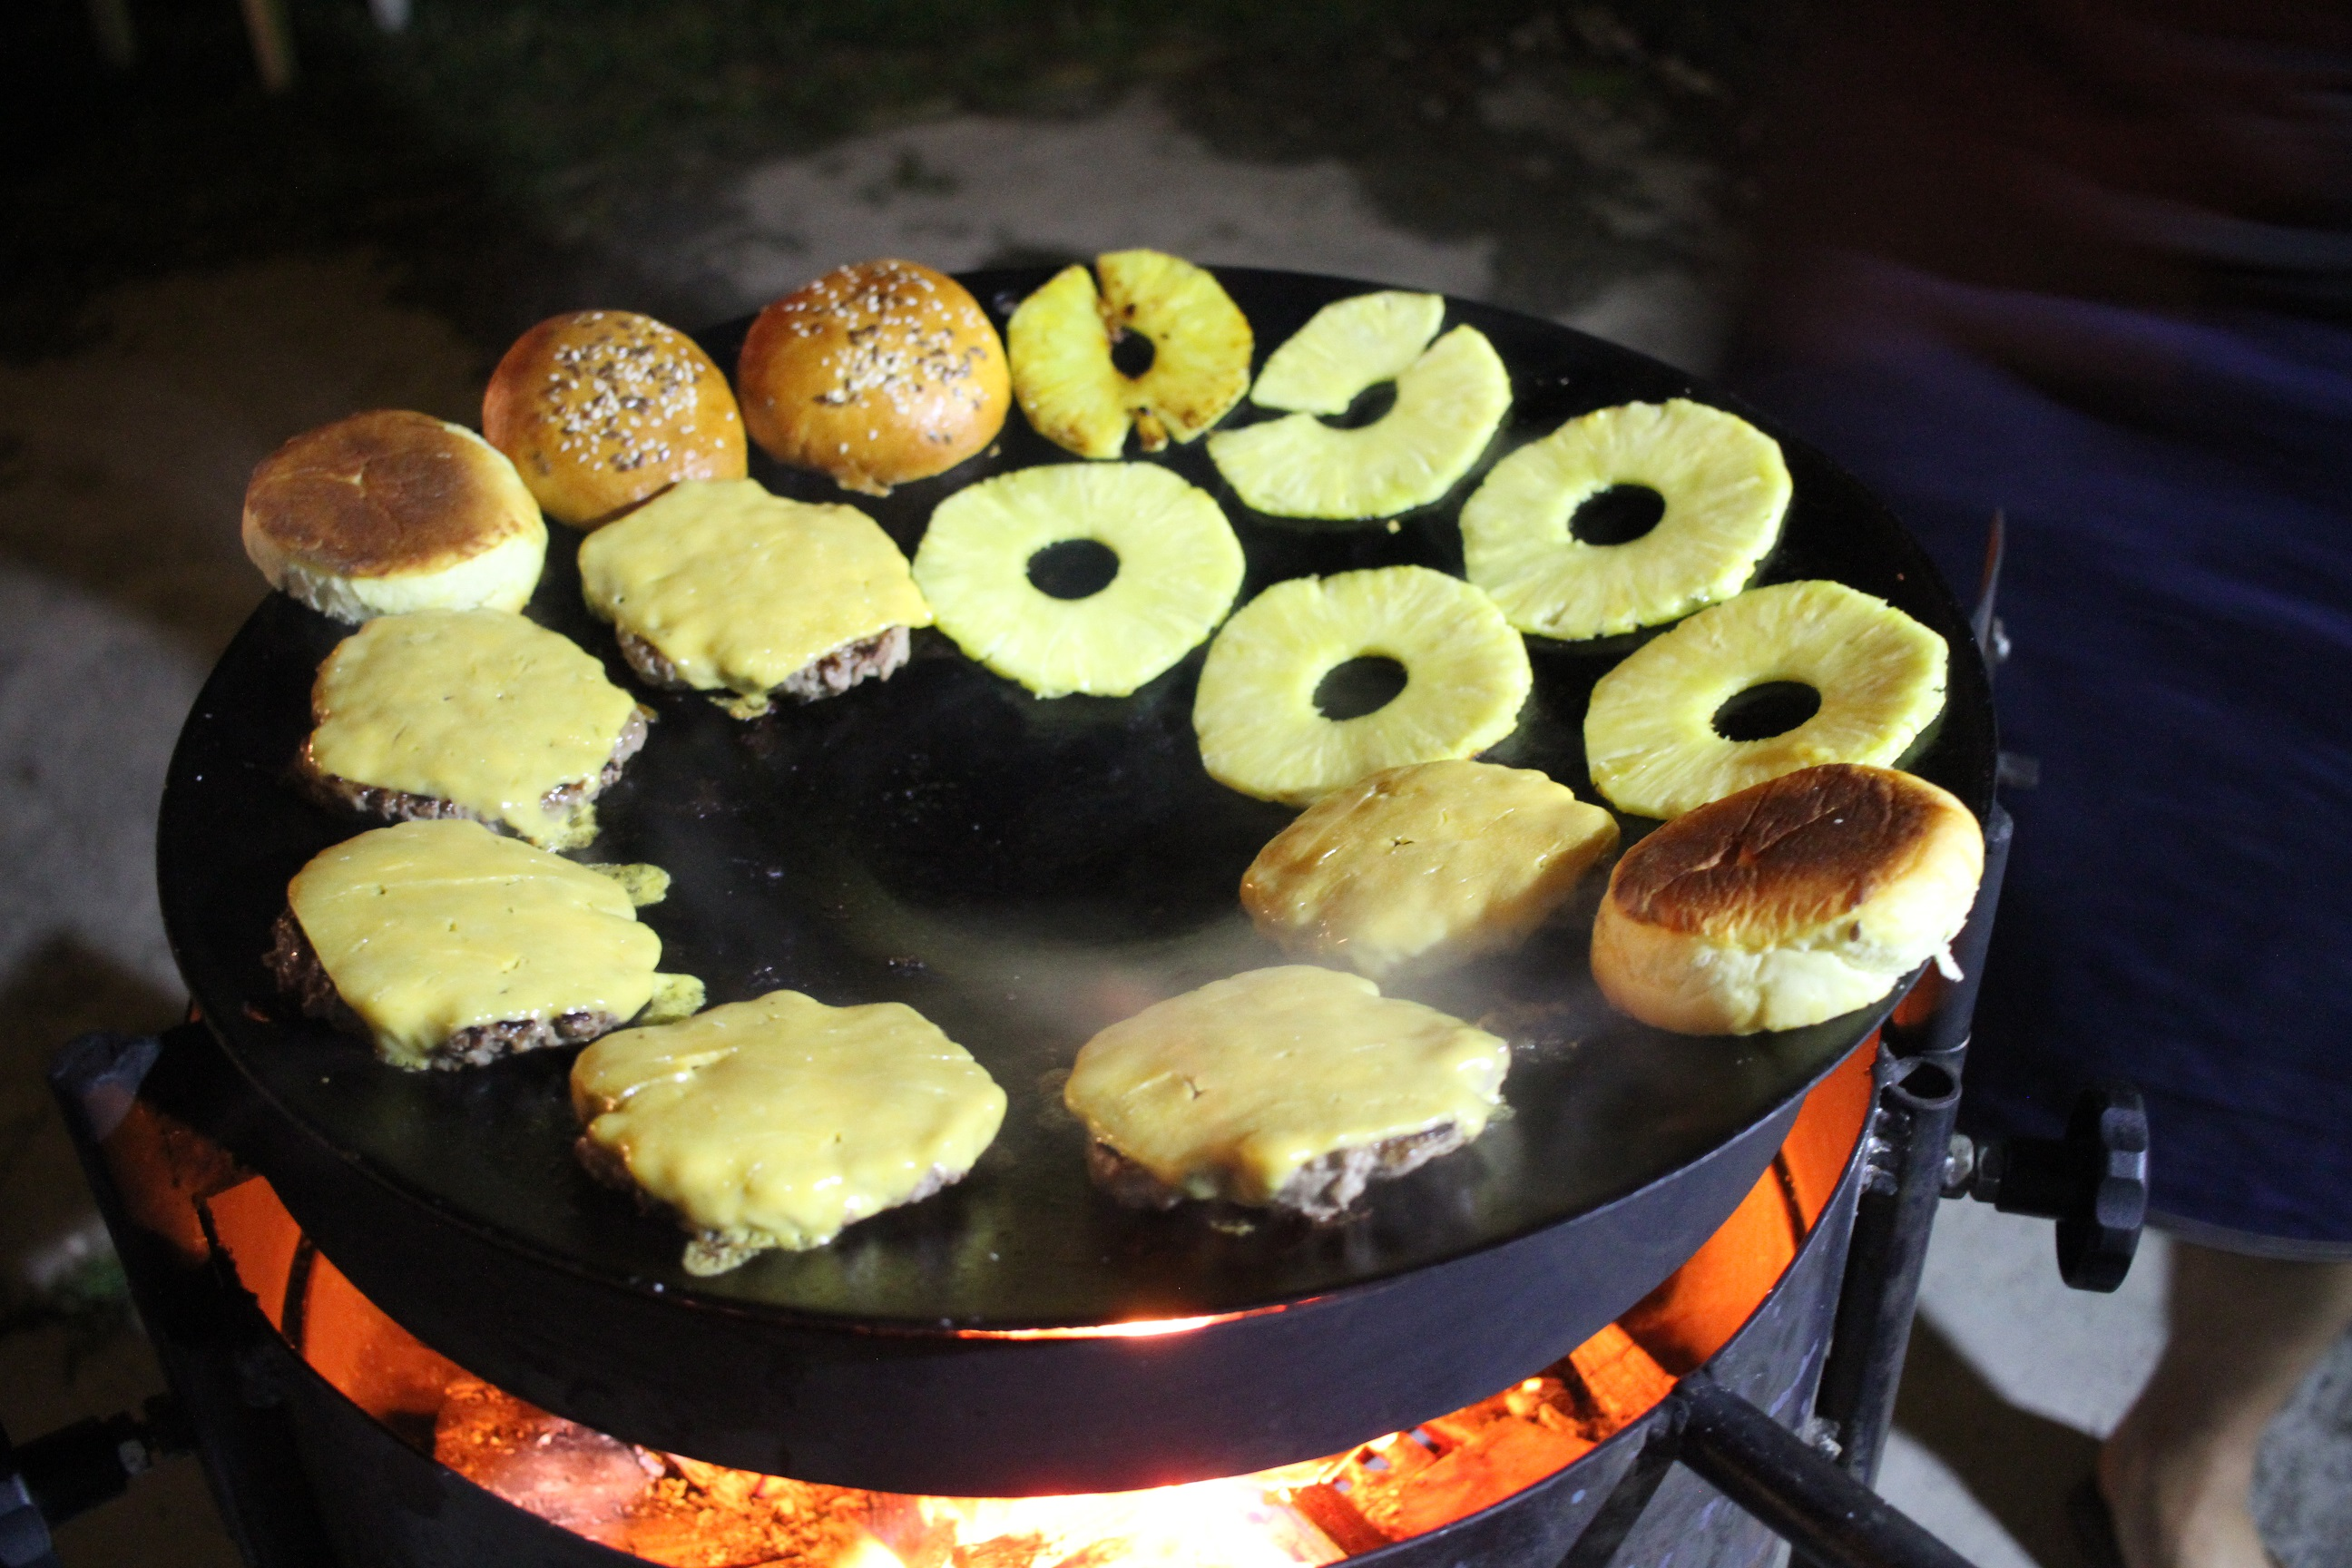 szmk_big_kahuna_burger_diy_recept_recepie_quentin_tarantino_pulp_fiction_csinald_magad_ponyvaregeny_jules_vincent_mia_wallace_zed_tasty_burger_royal_with_cheese_23.JPG